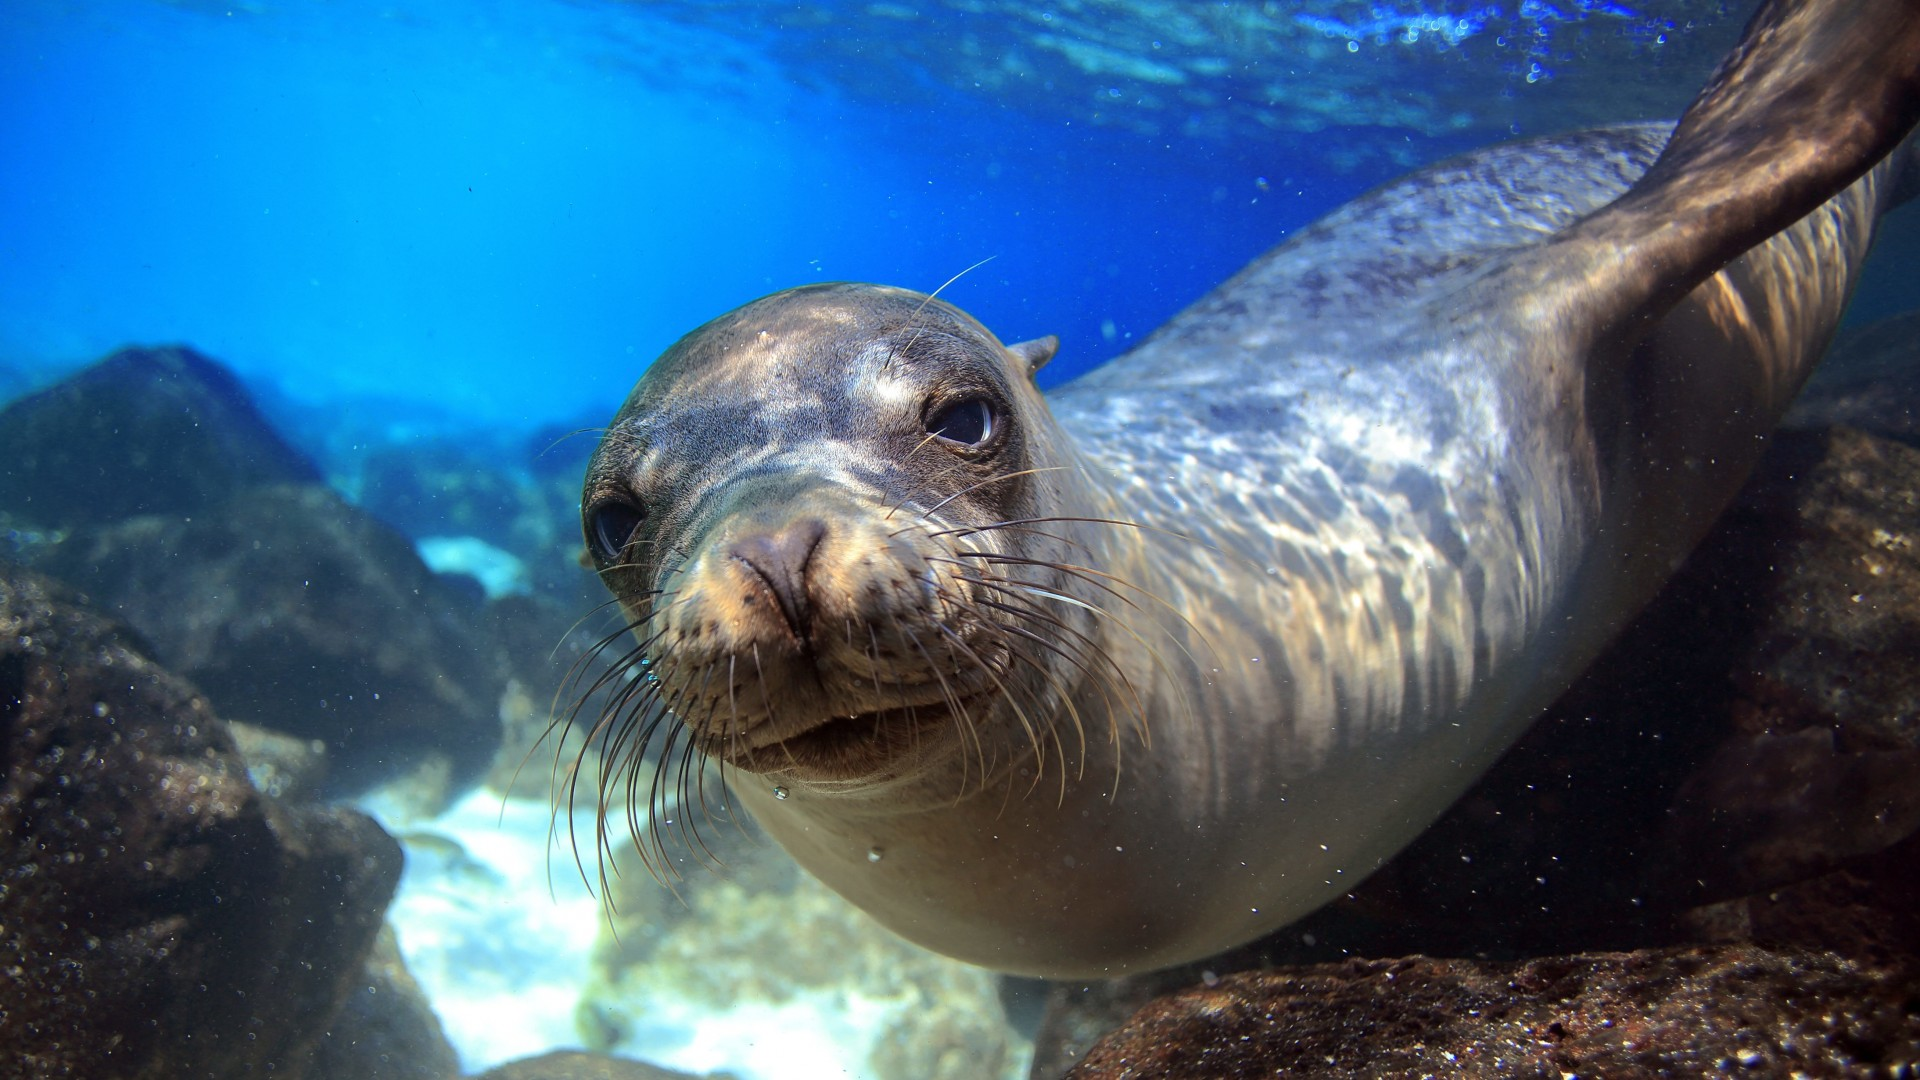 what is a sea lion a mammal or amphibian